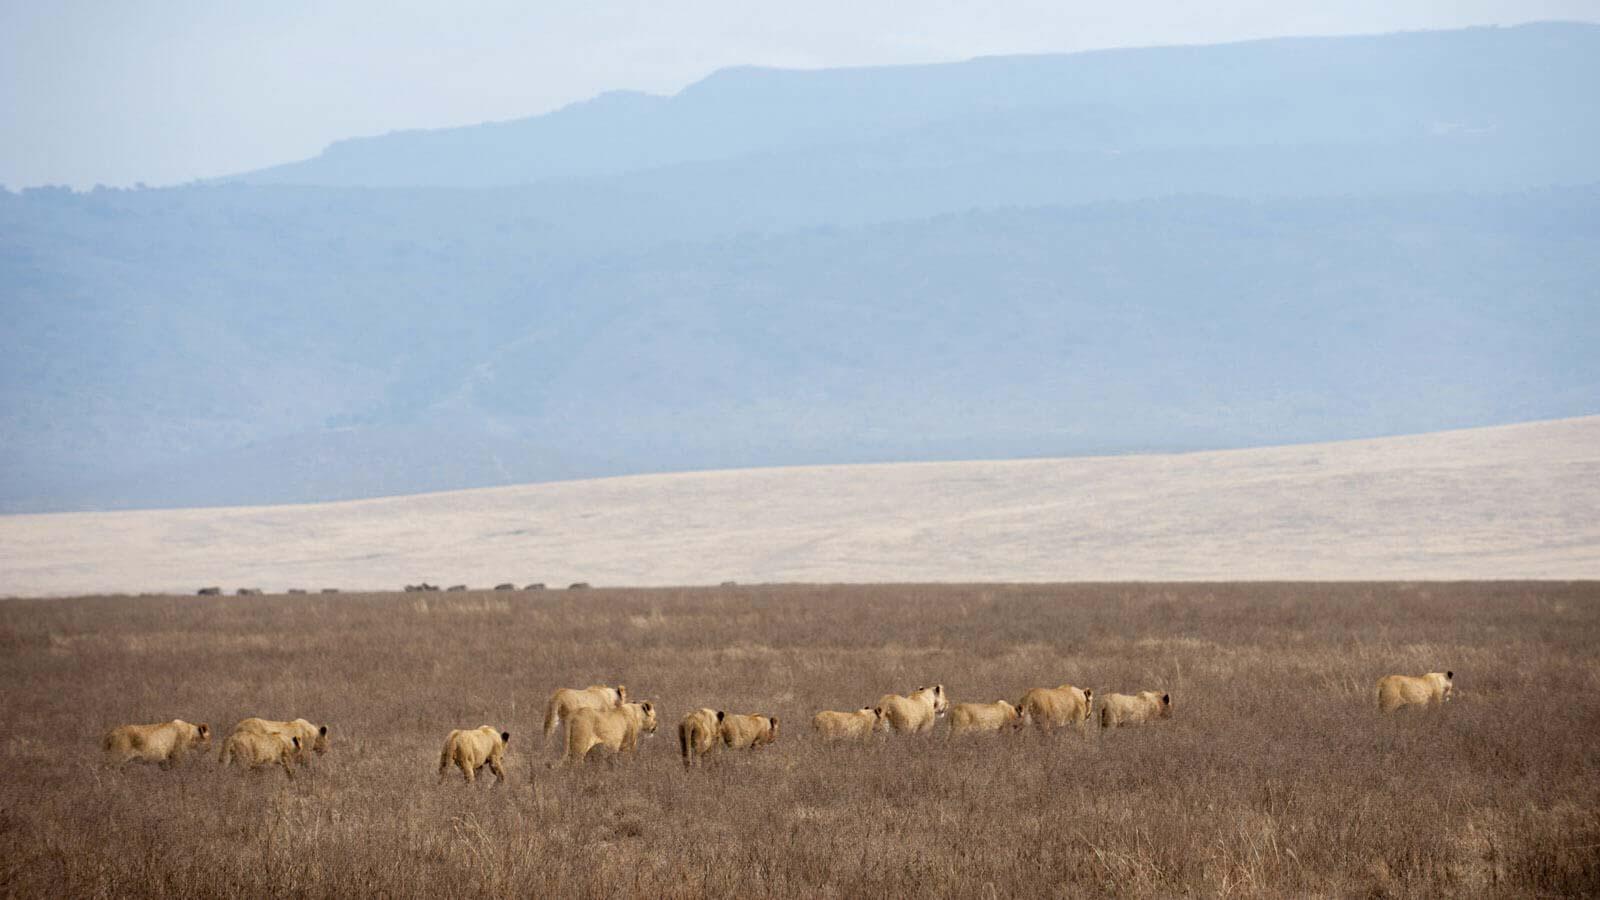 Official Tanzania Safari | Luxury Tanzania Safari Tours